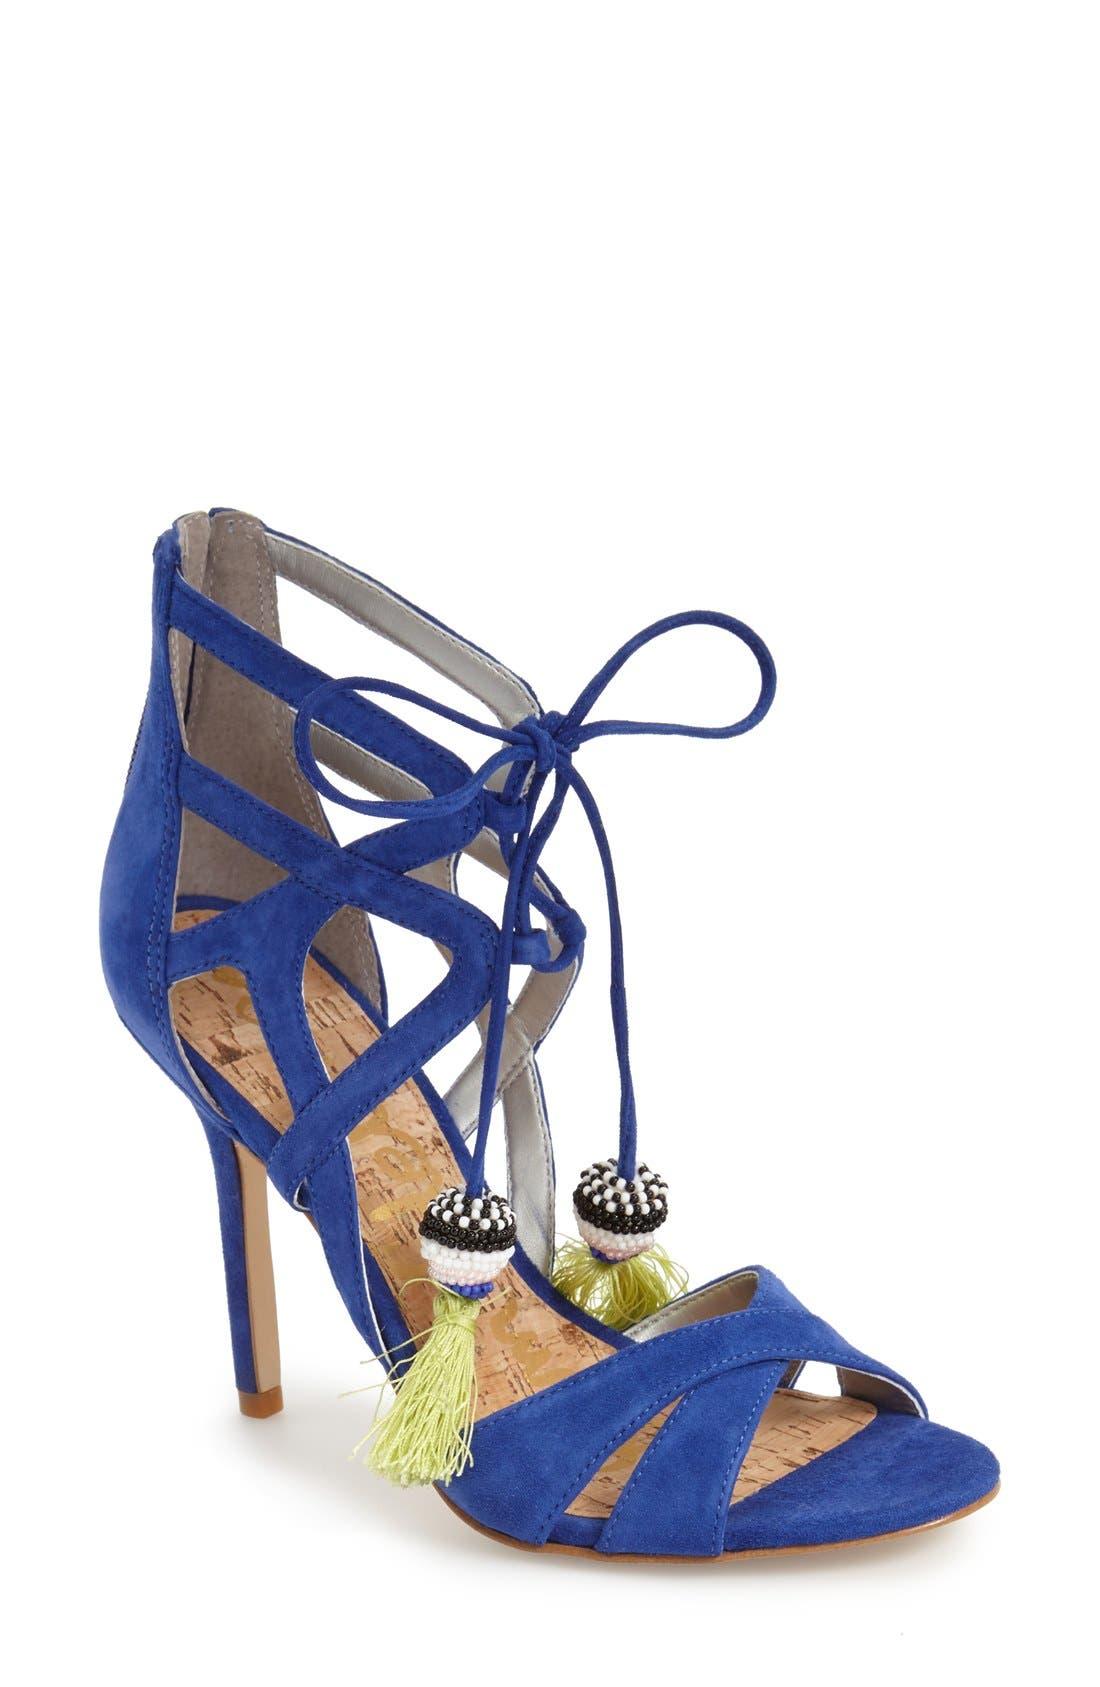 Alternate Image 1 Selected - Sam Edelman 'Azela' Tassel Lace-Up Sandal (Women)